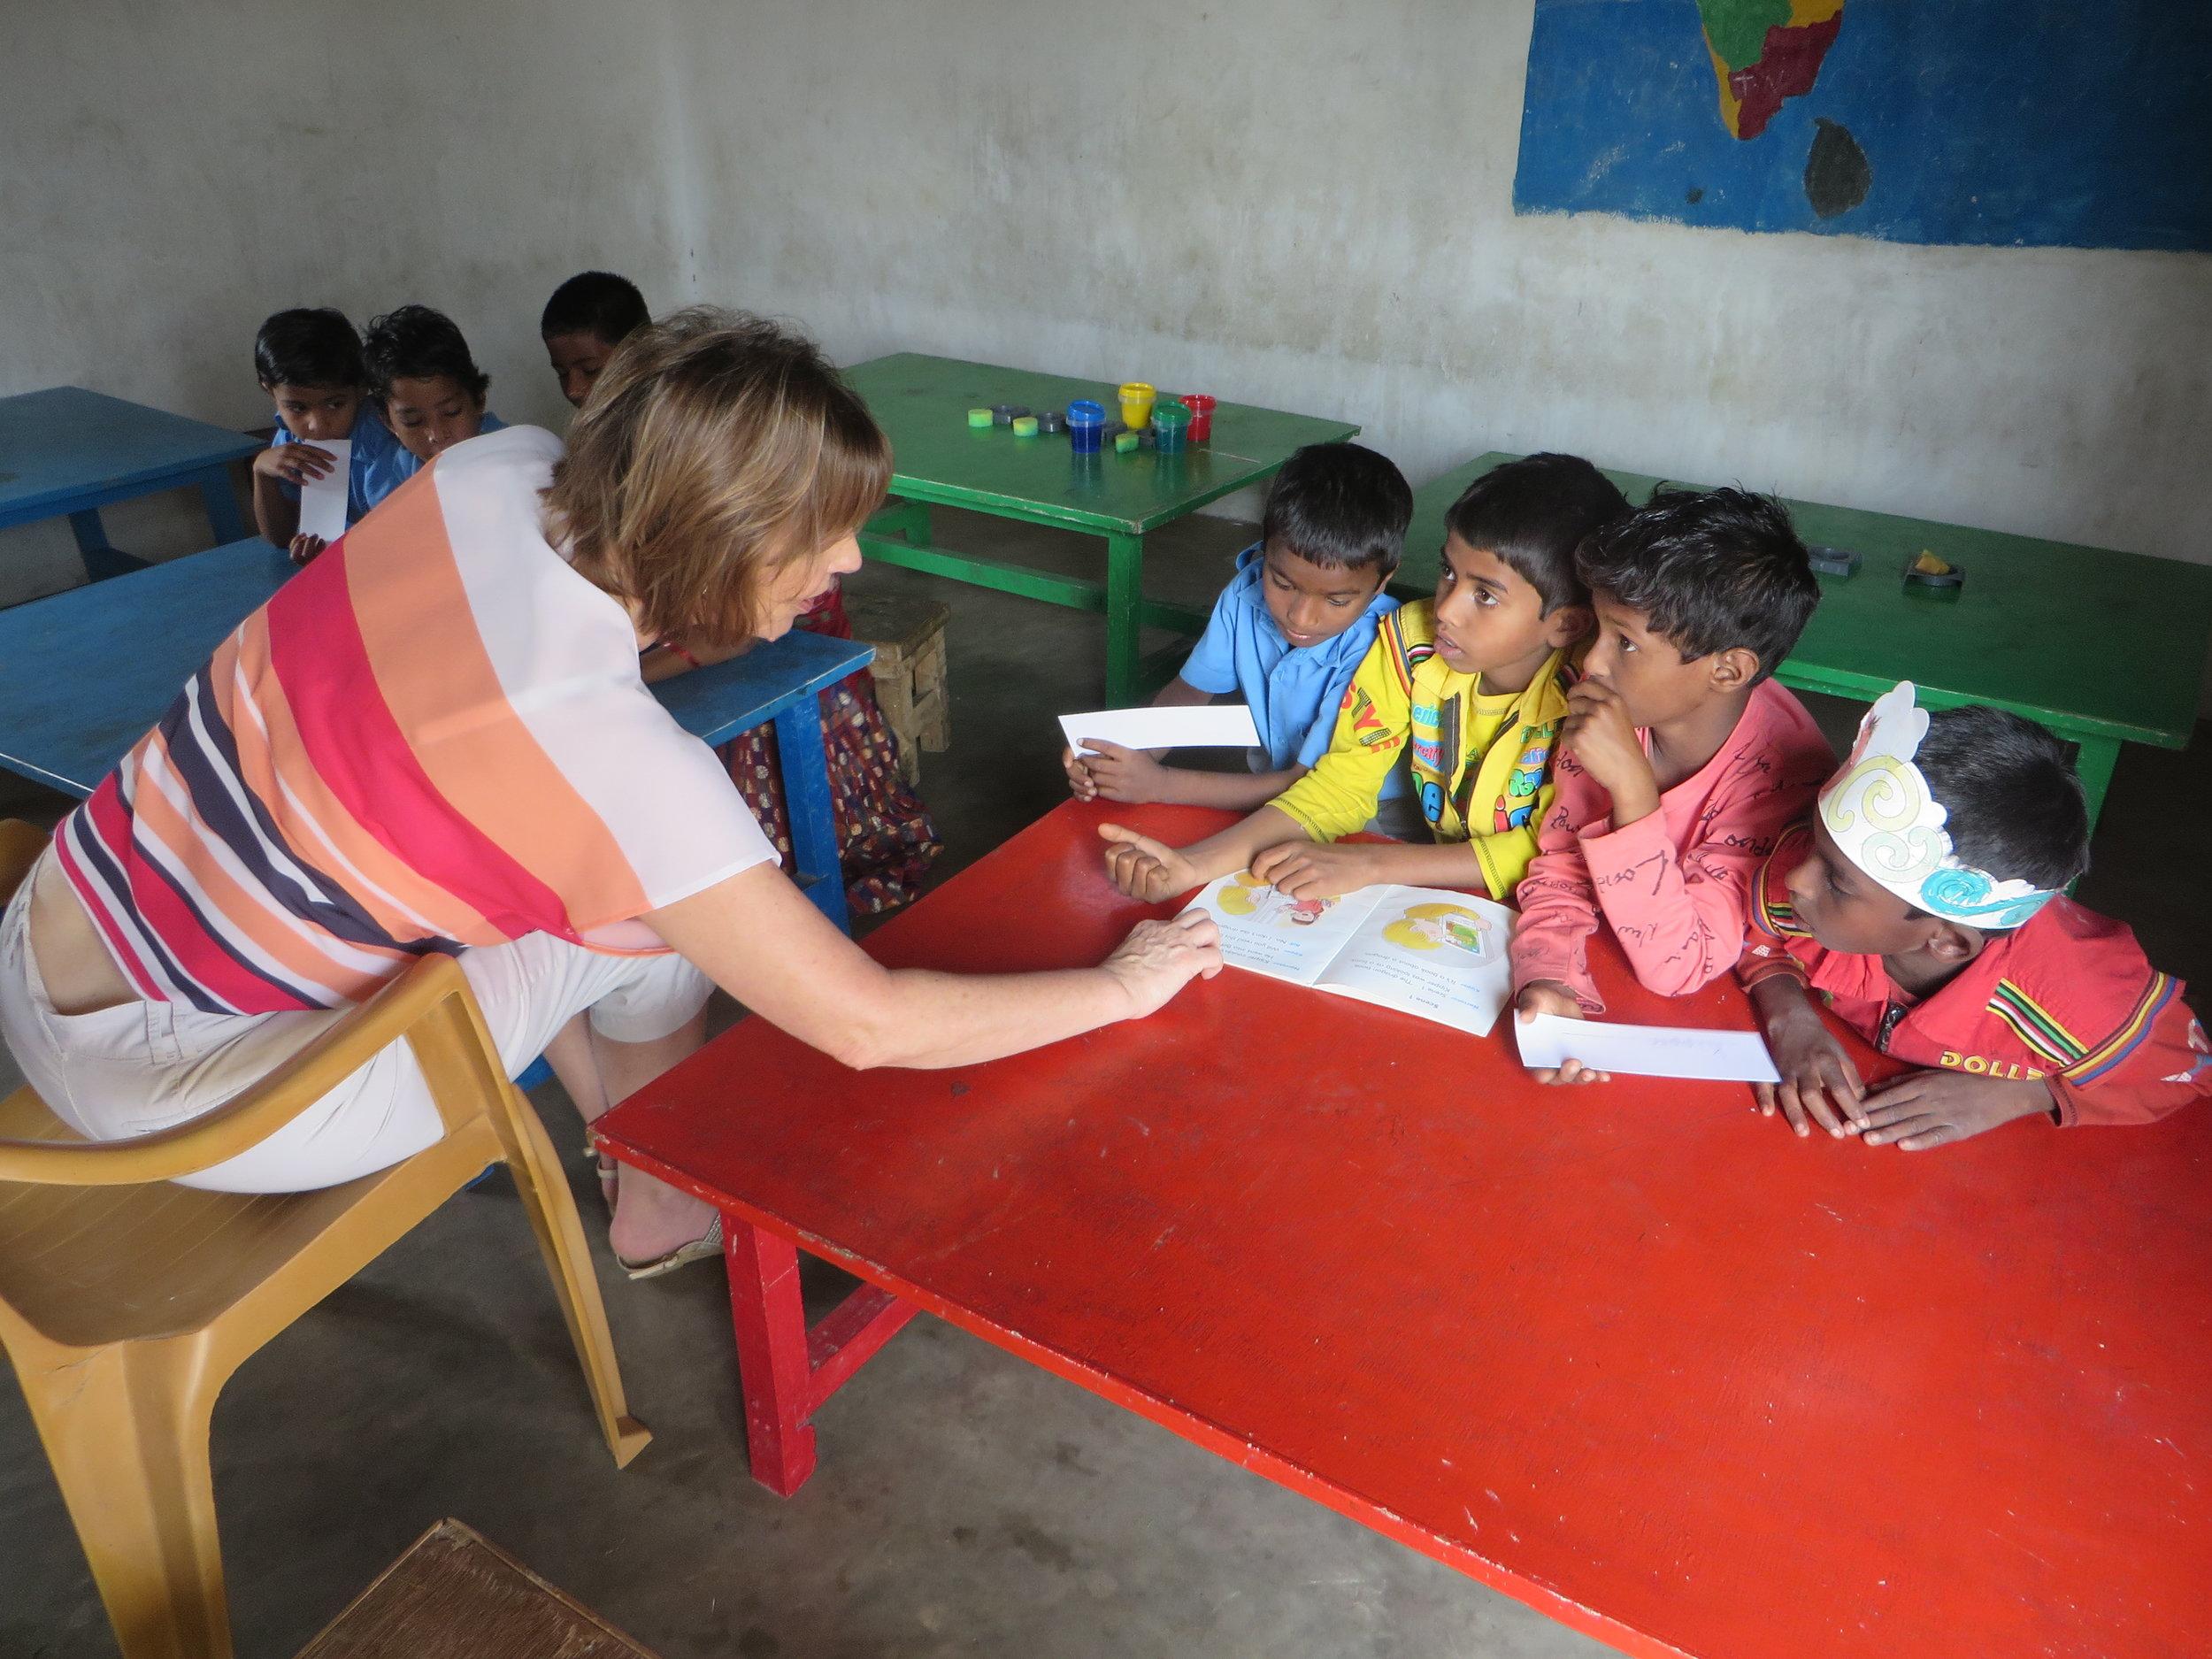 Working in school to hep improve English